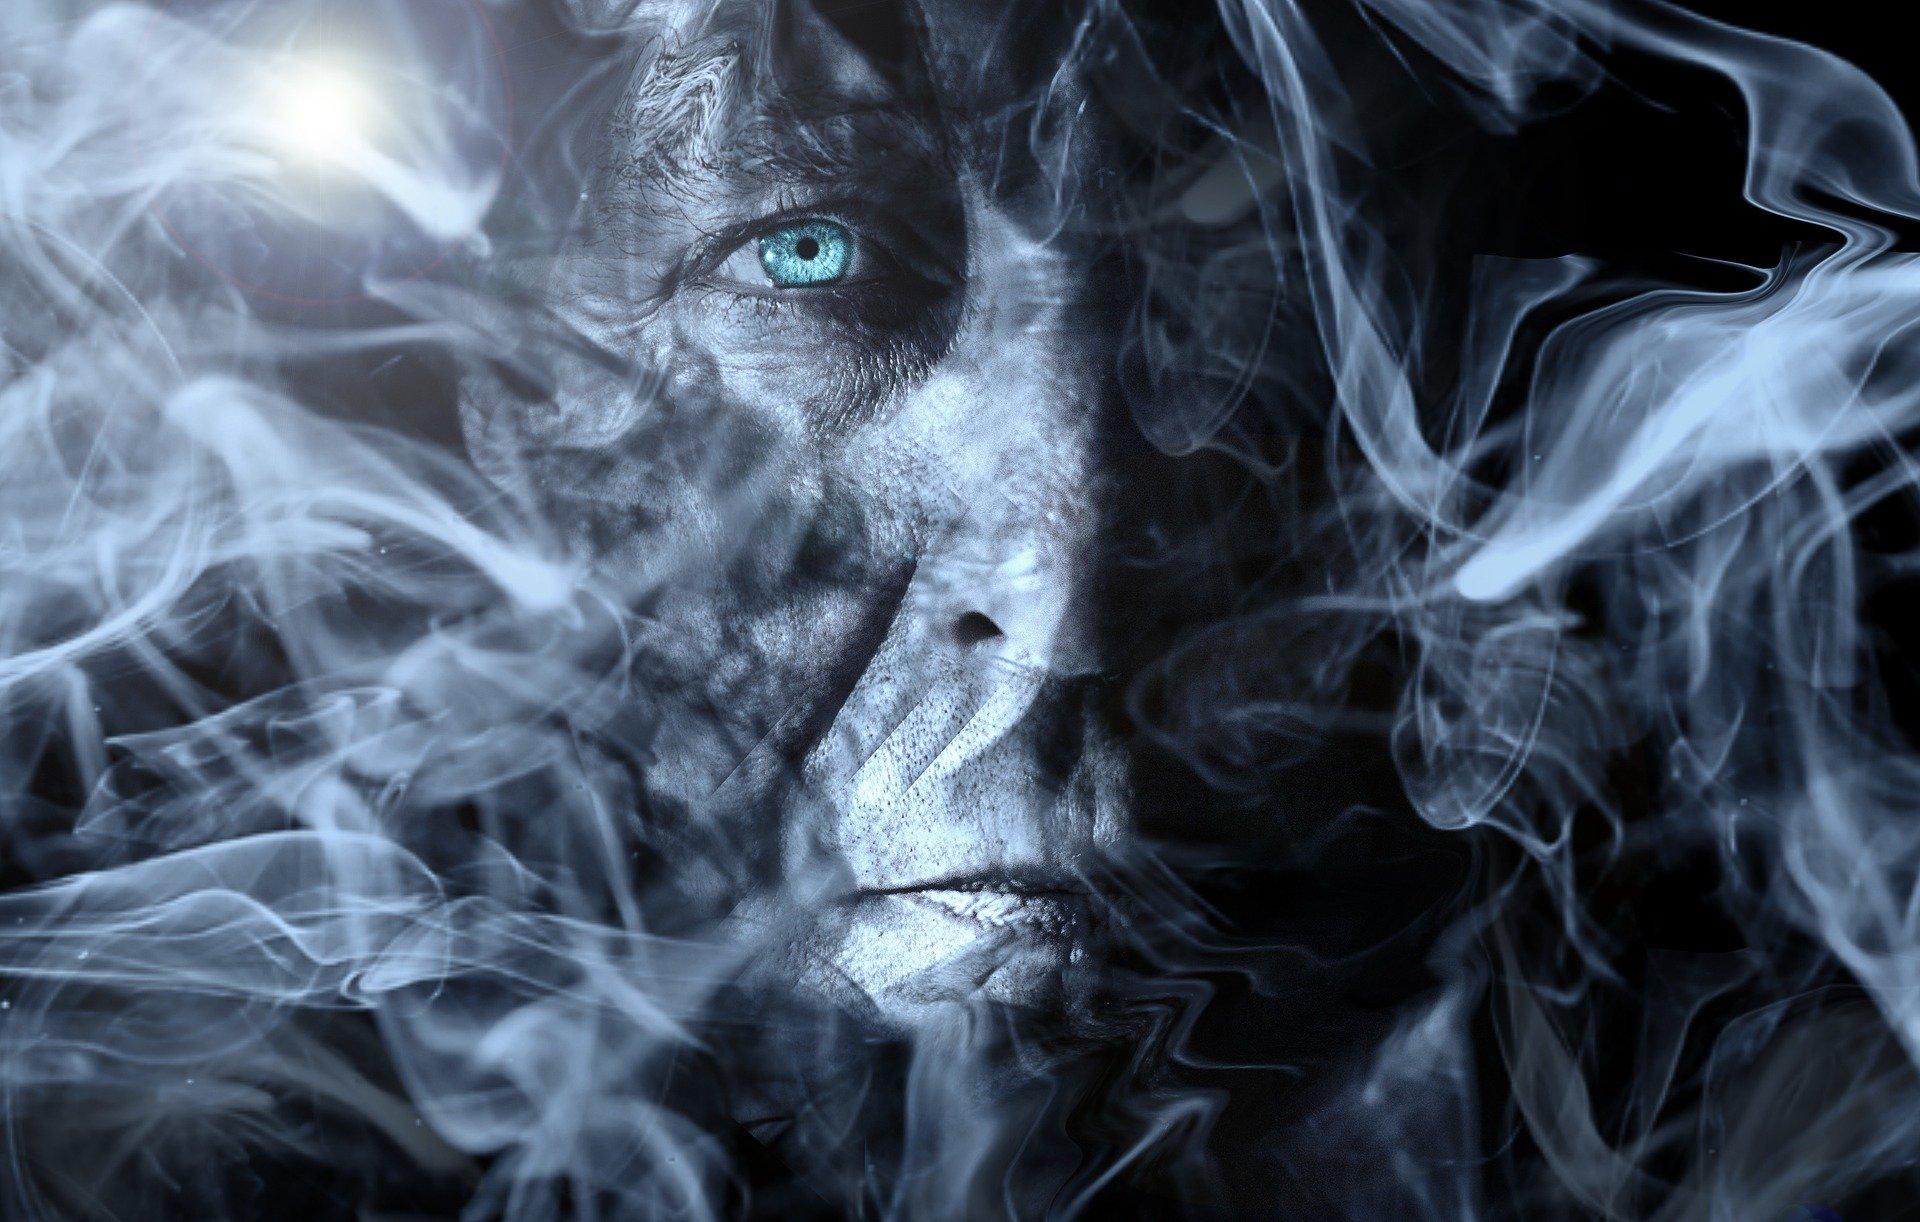 Blood vessel function takes harmful hit from hookah tobacco smoking